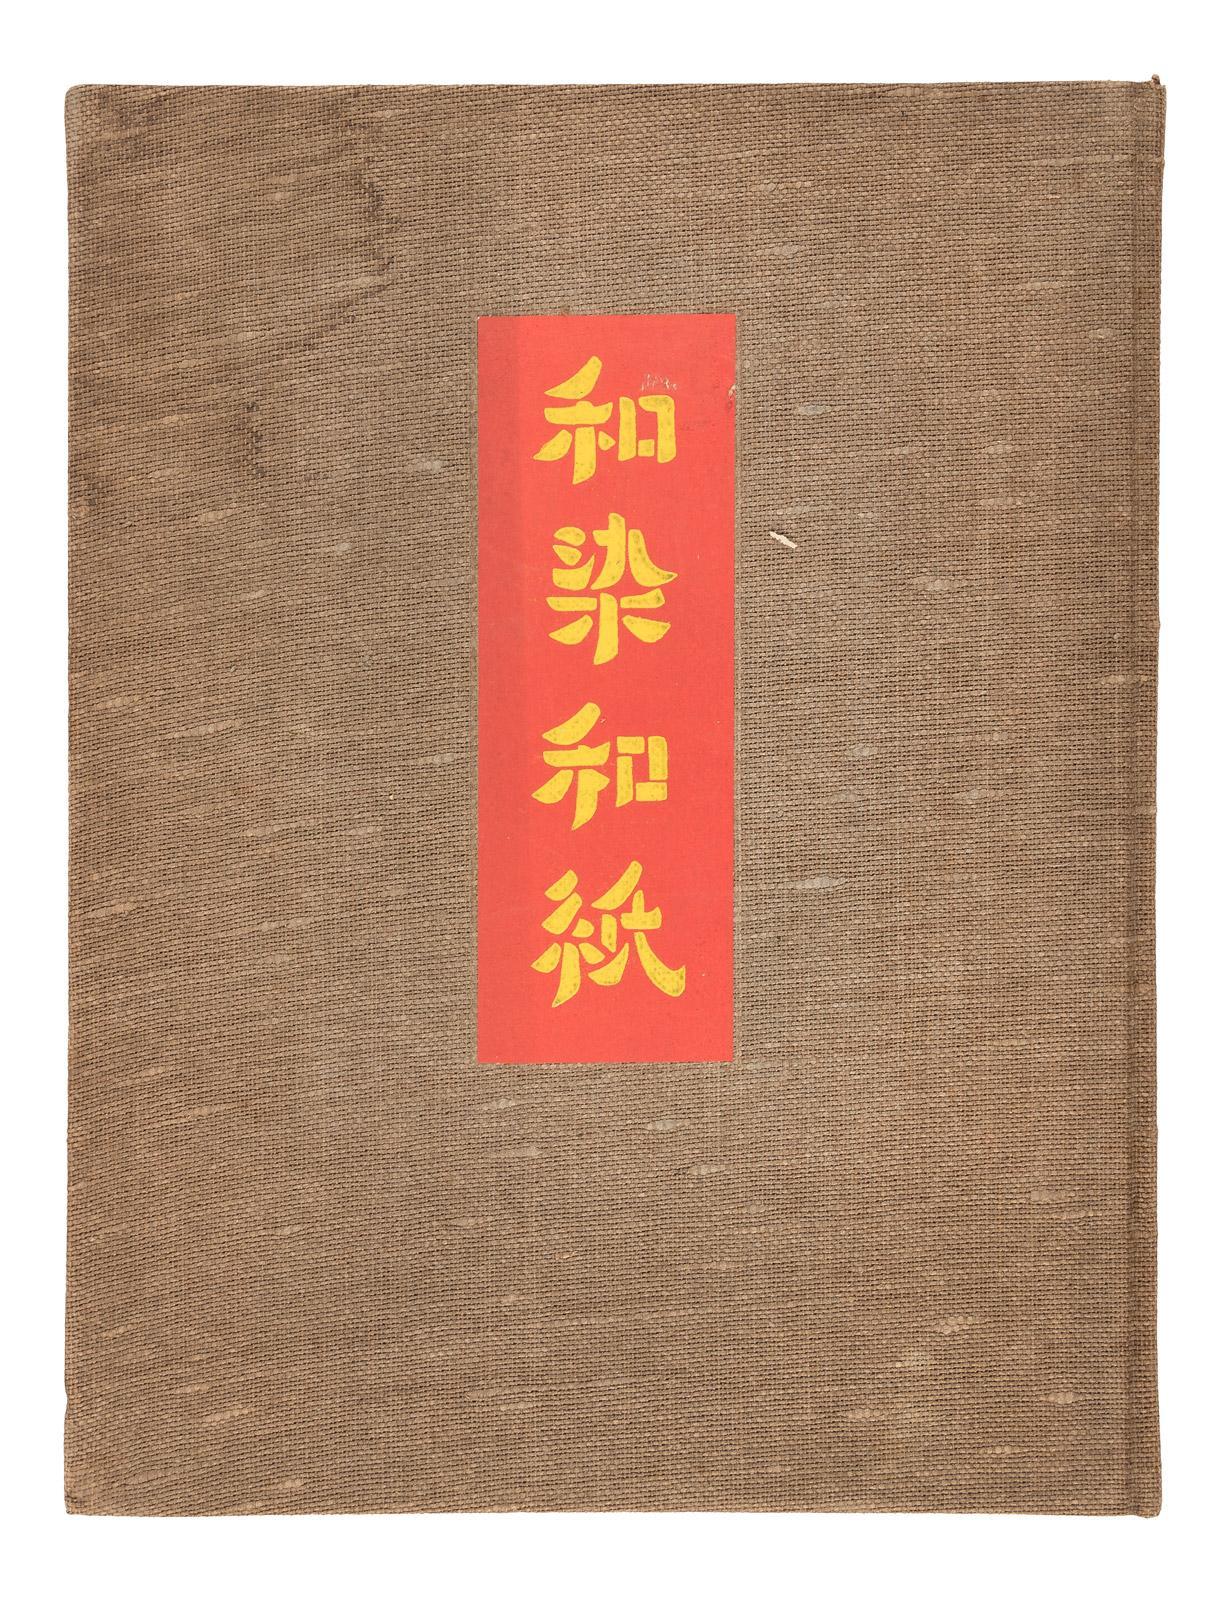 japanese book of paper samples price estimate 200 300